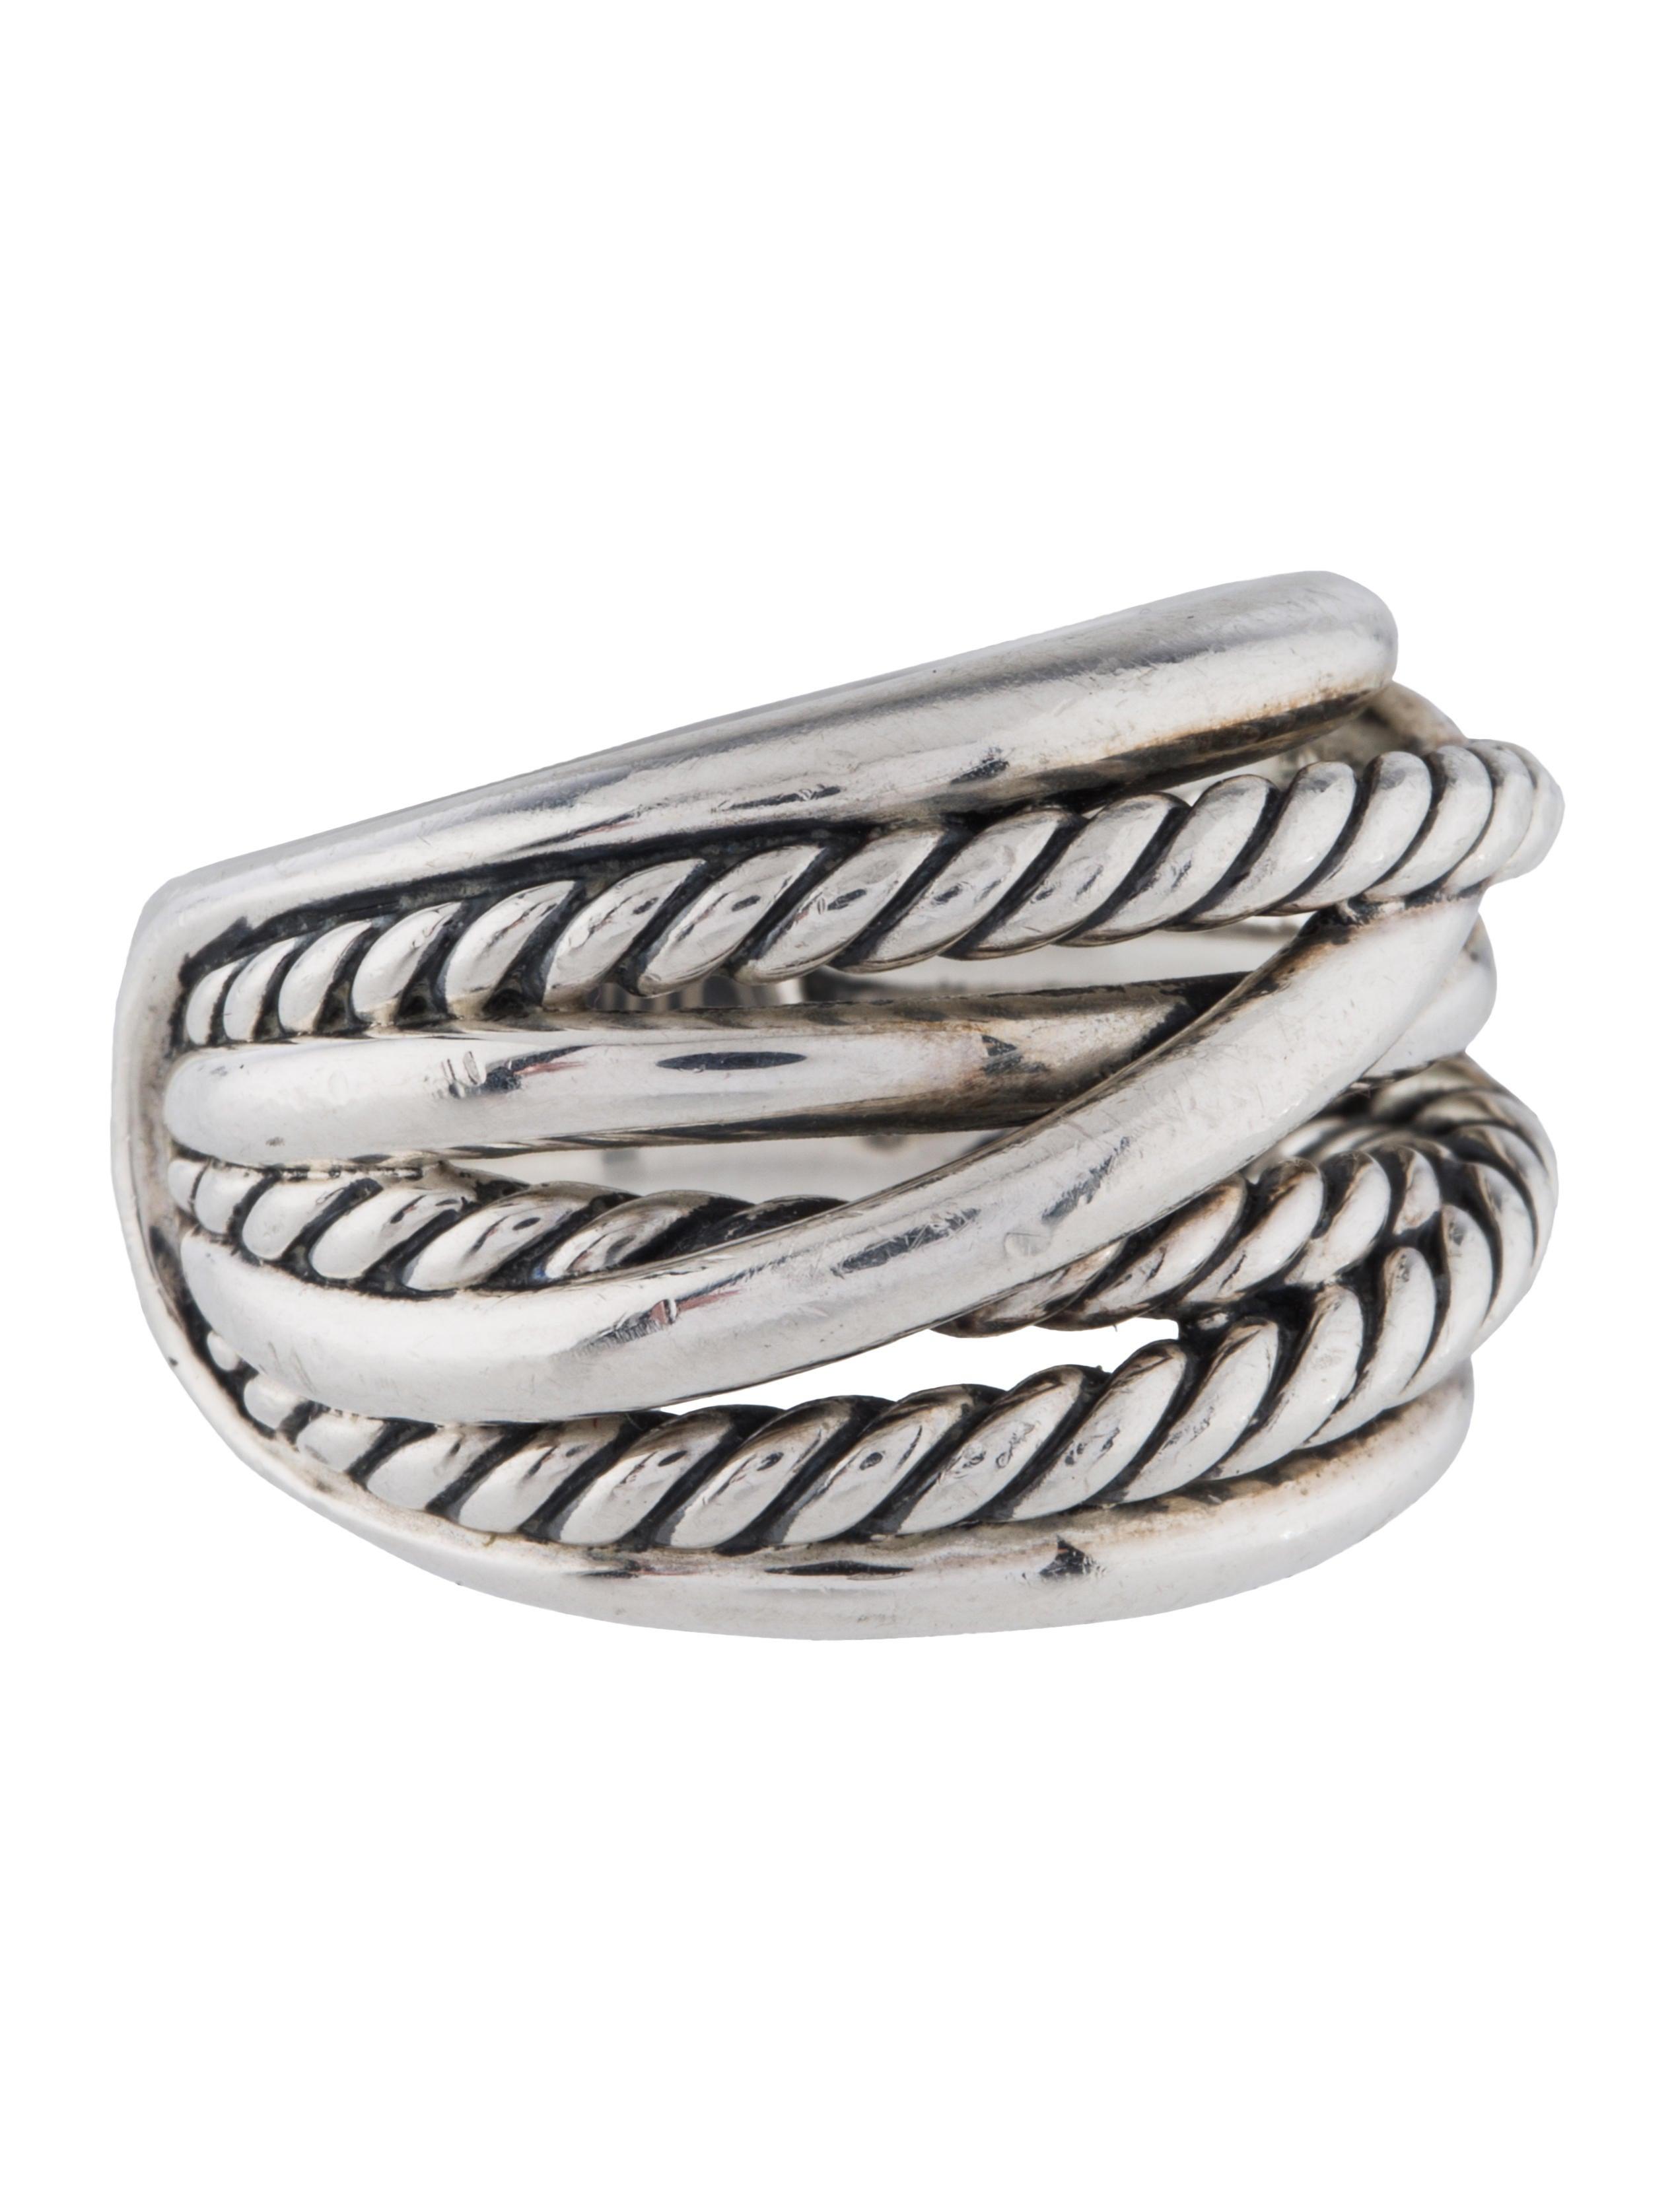 David yurman crossover wide ring rings dvy44828 the for David yurman inspired jewelry rings